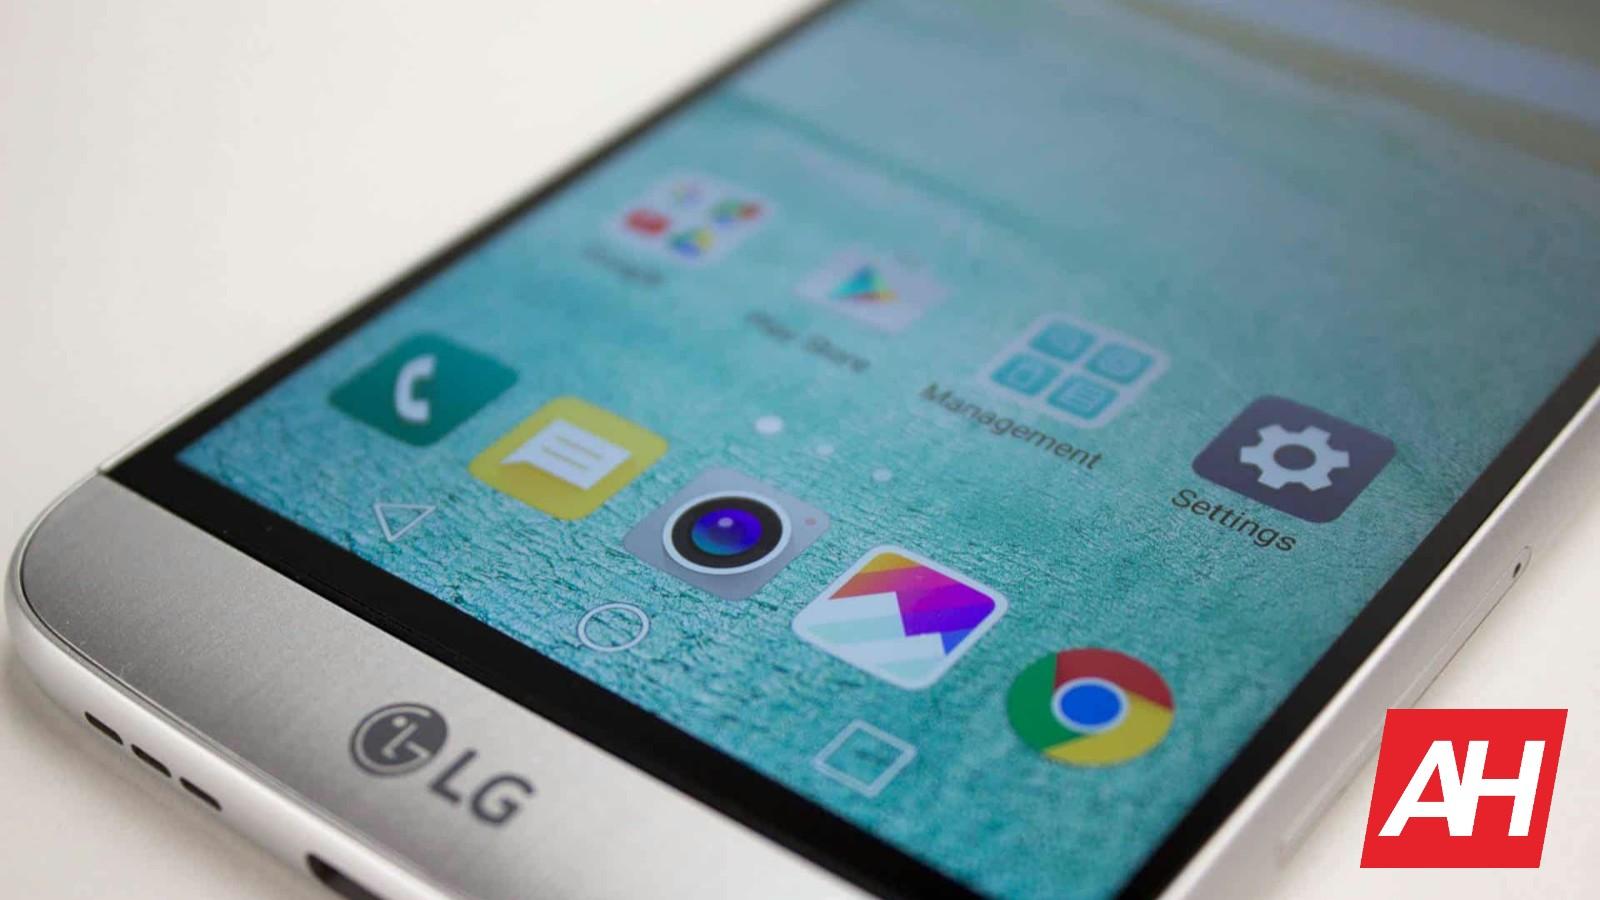 AH LG G5 new logo image 2